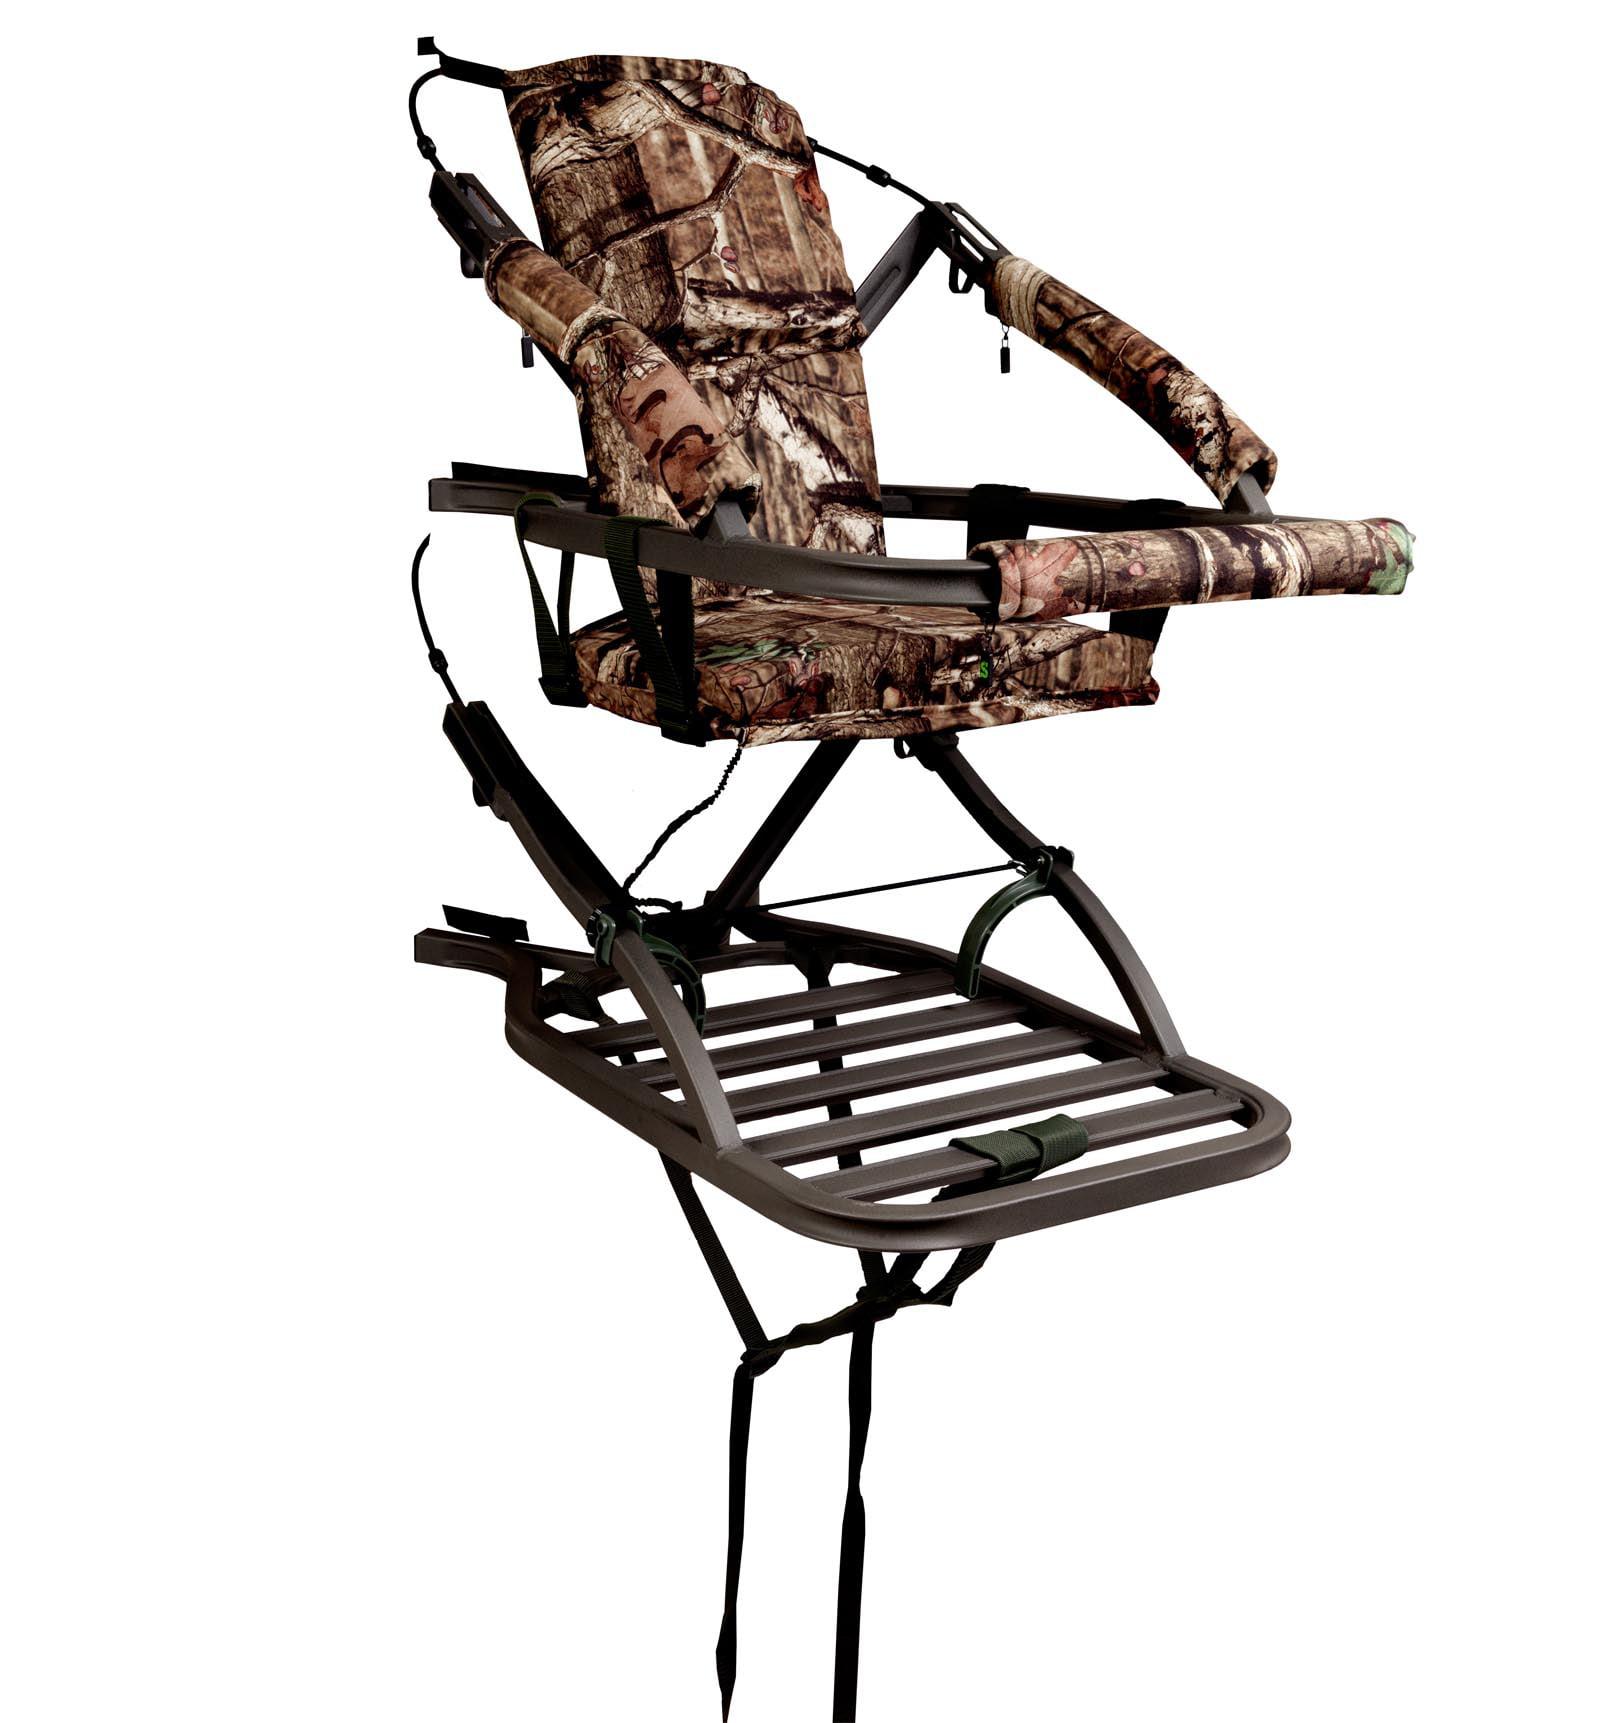 Summit Viper SD 81120 Self Climbing Treestand 300 Lbs - Bow & Rifle Deer Hunting